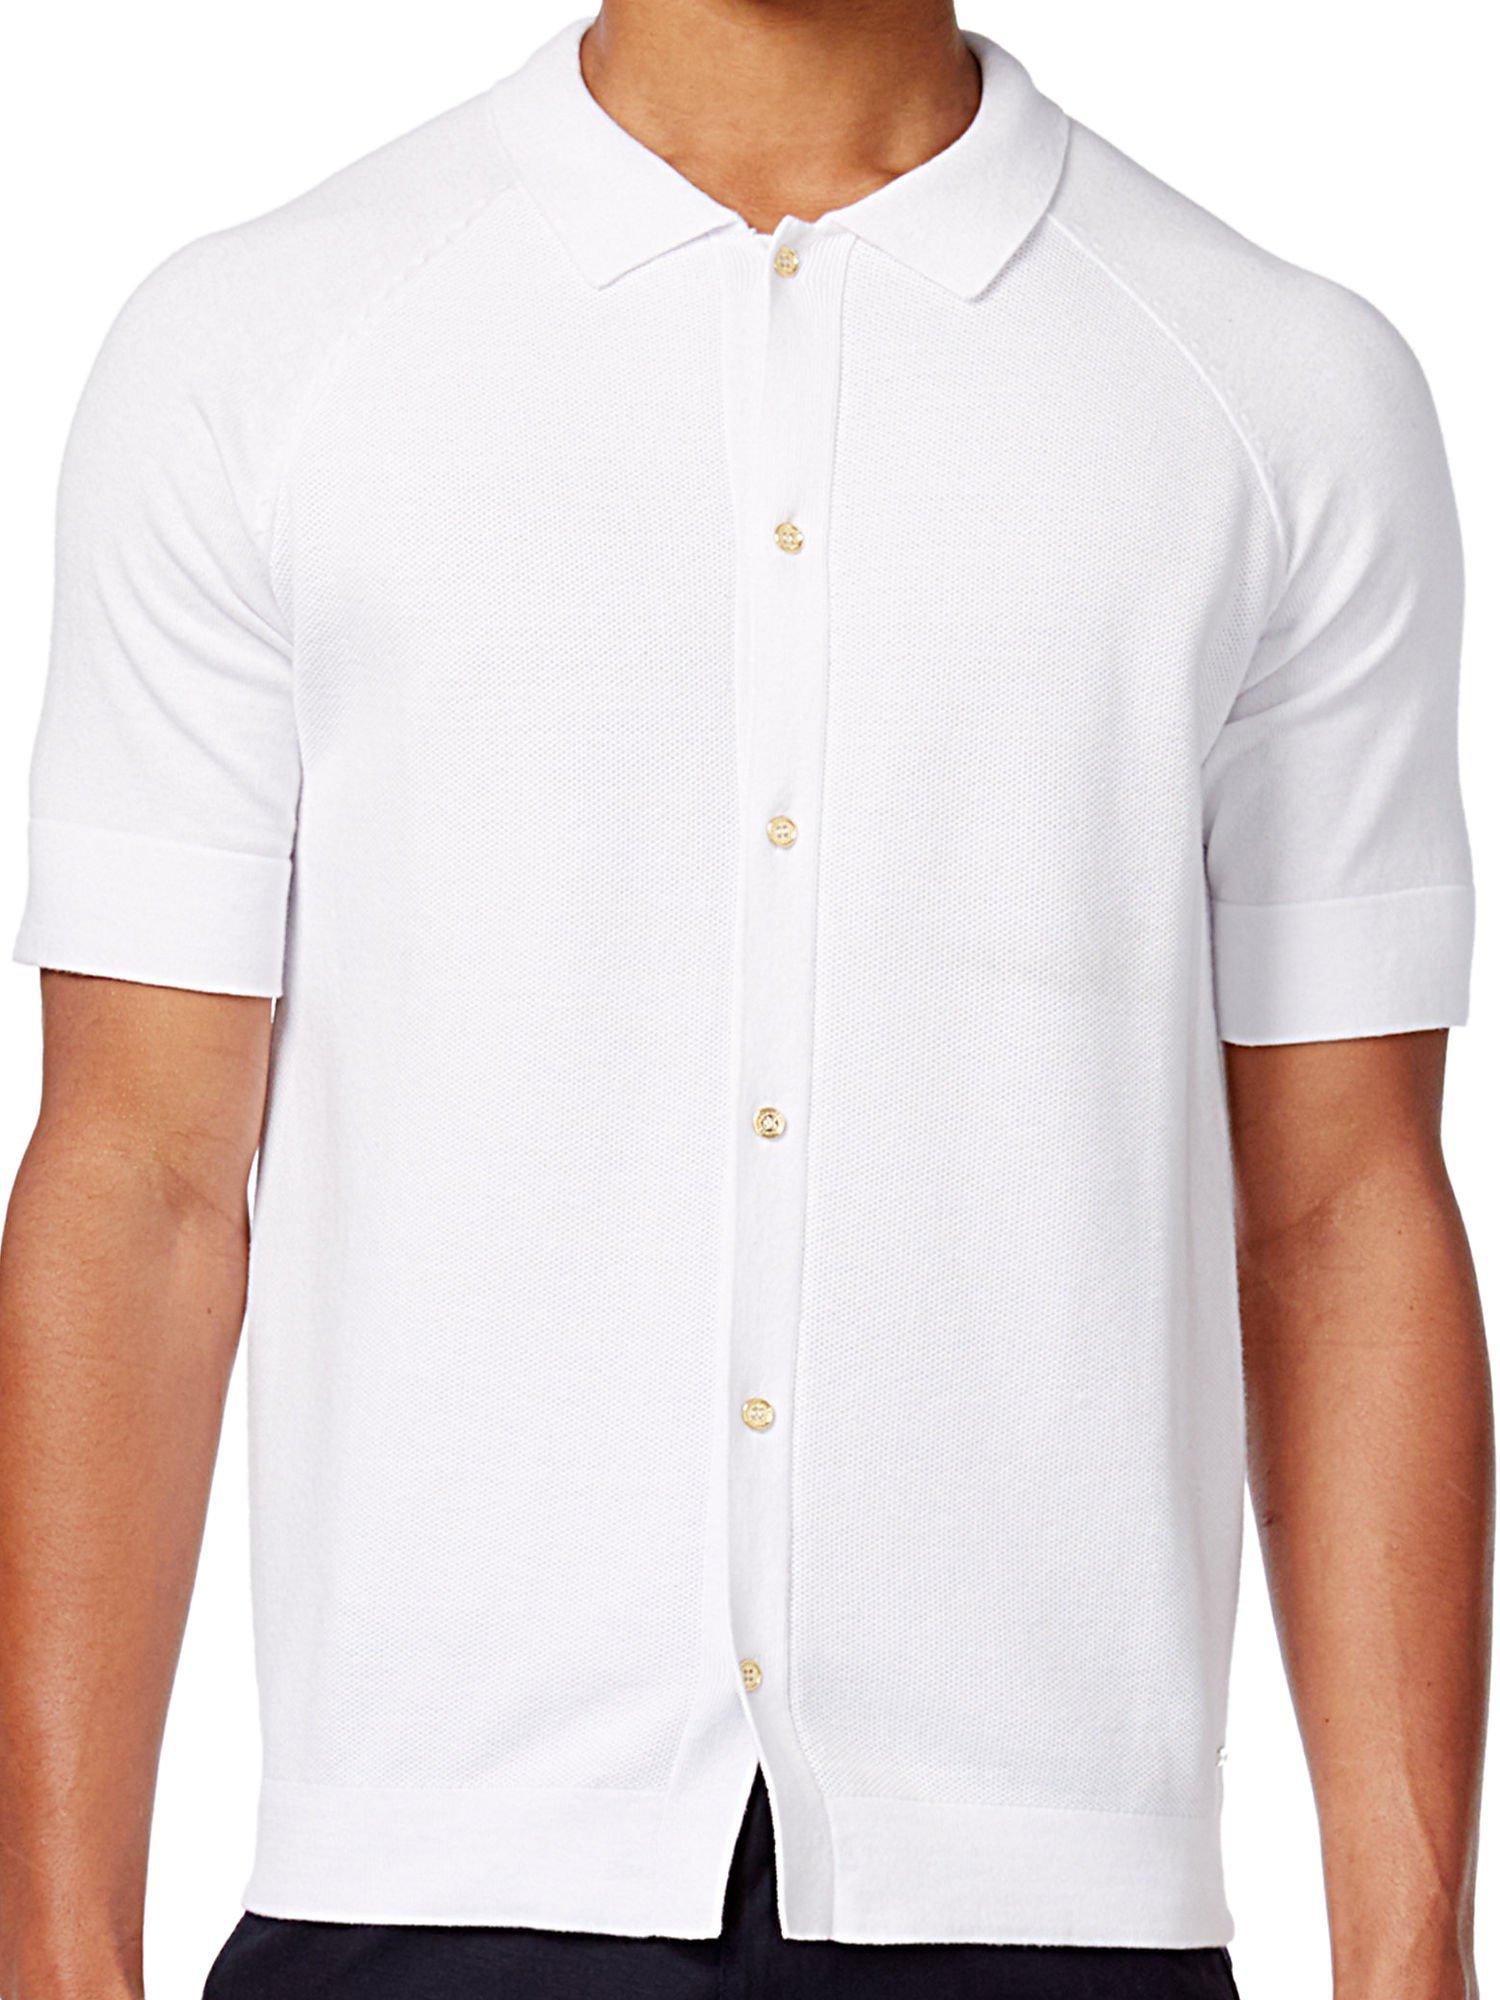 Sean John Mens Short-Sleeve Button-Front Cotton Sweater Bright White 2XL